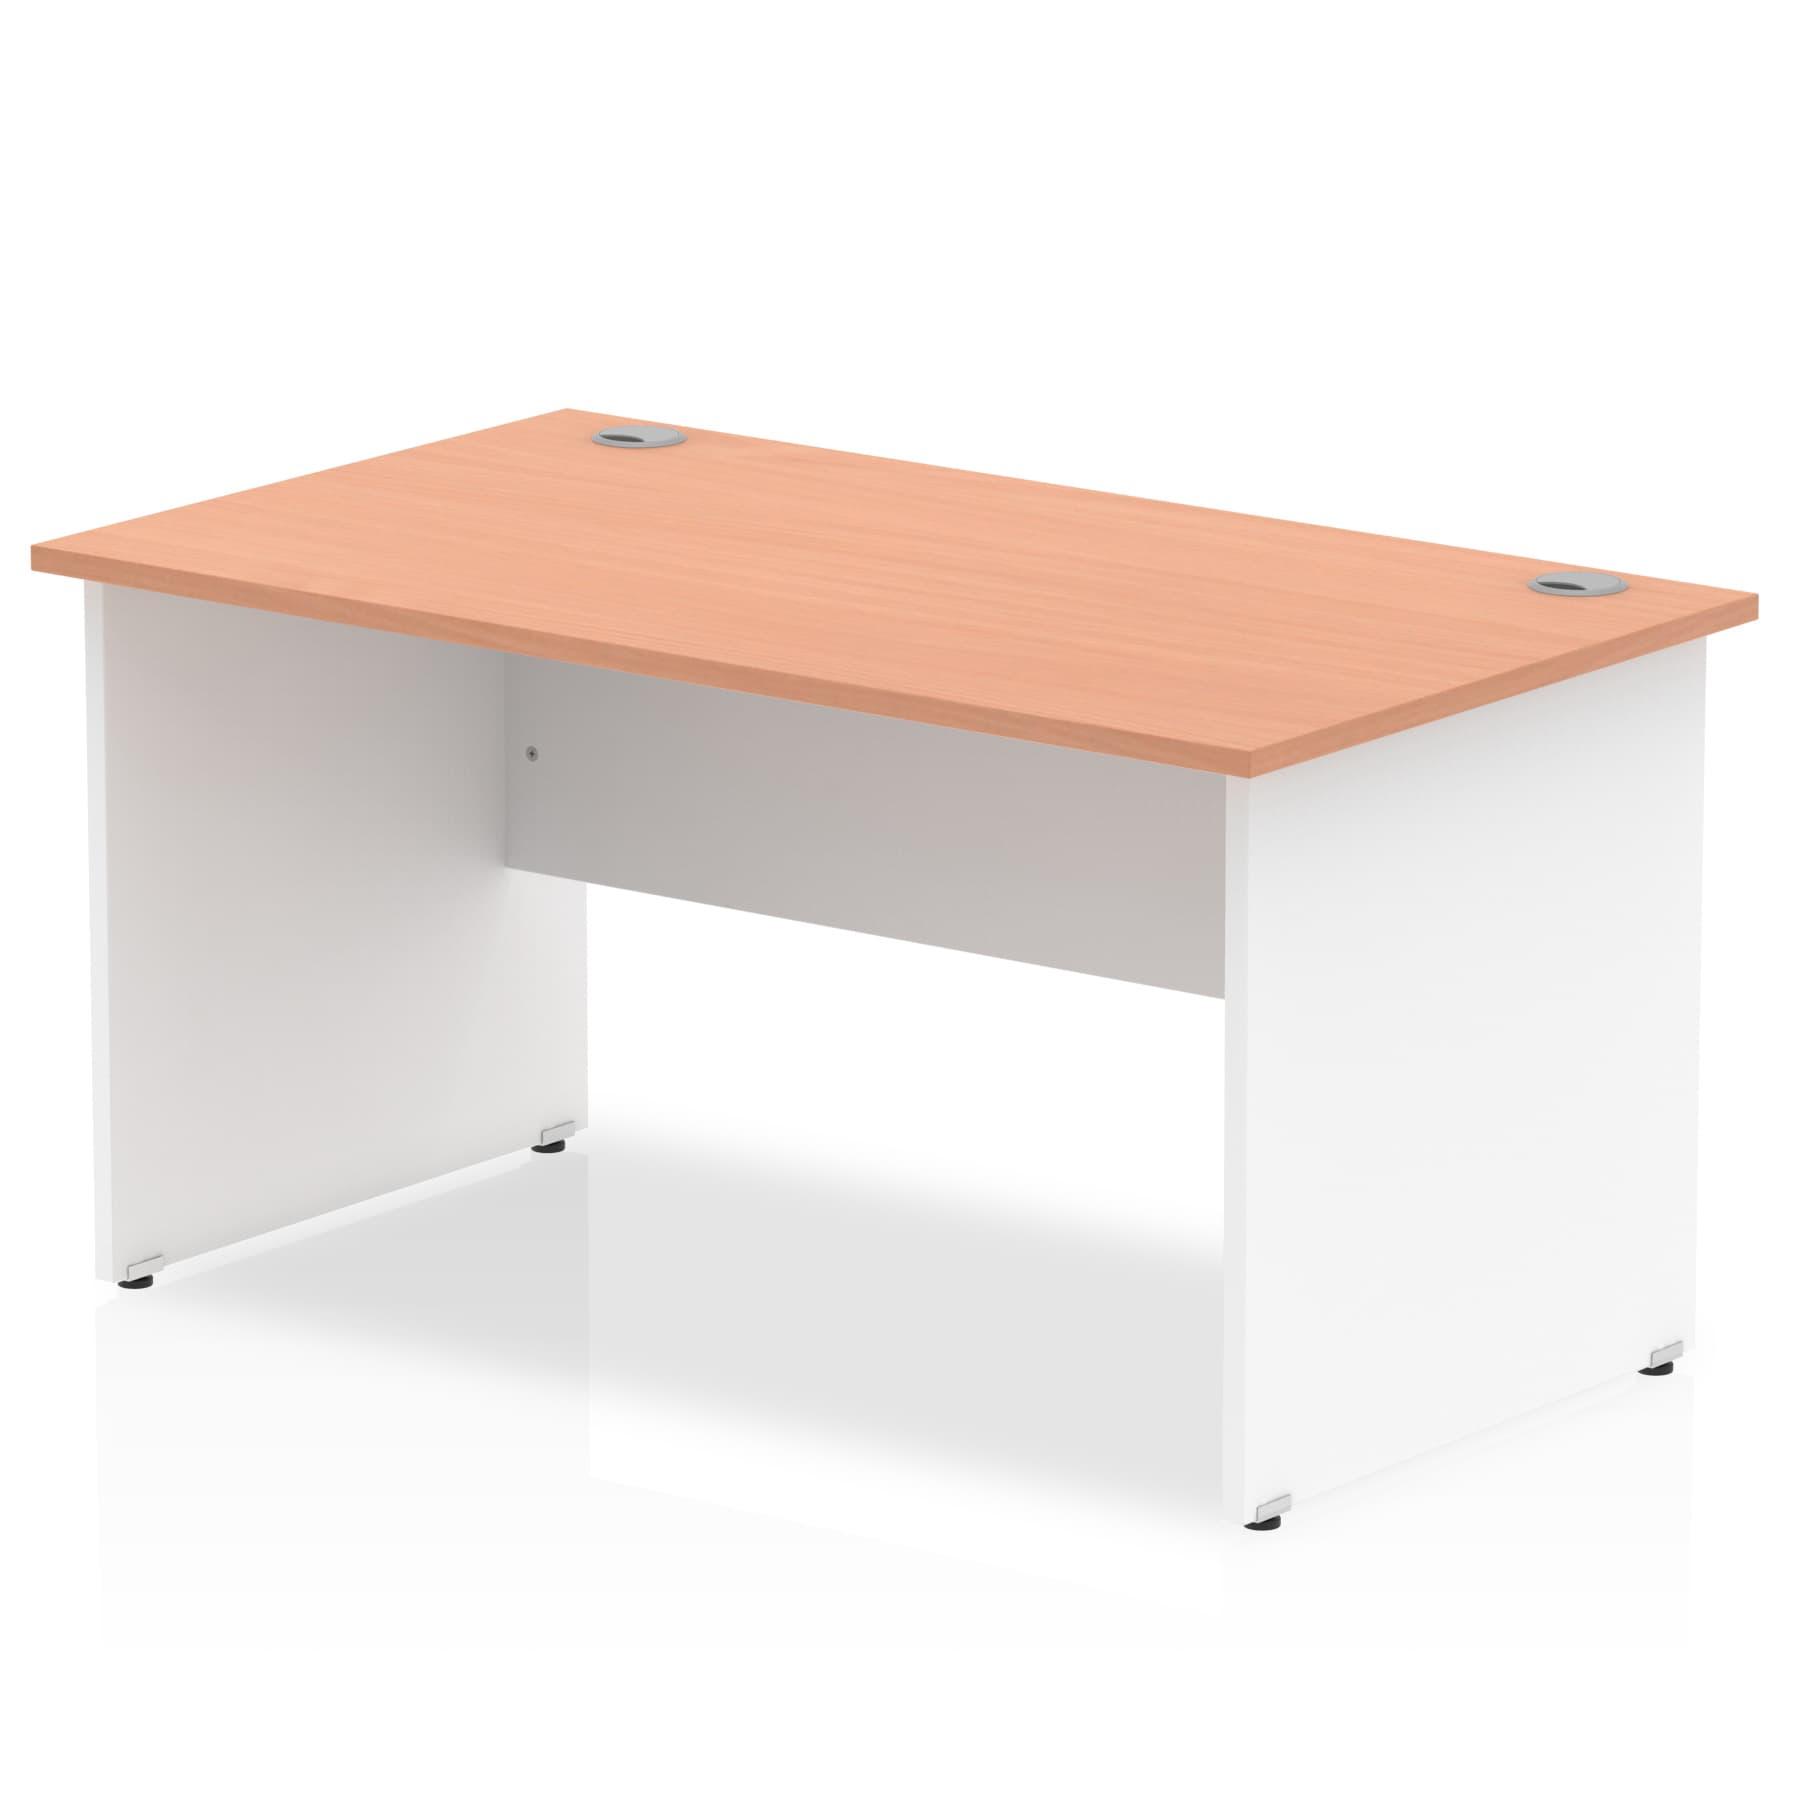 Impulse Panel End 1400 Rectangle Desk with White Panels